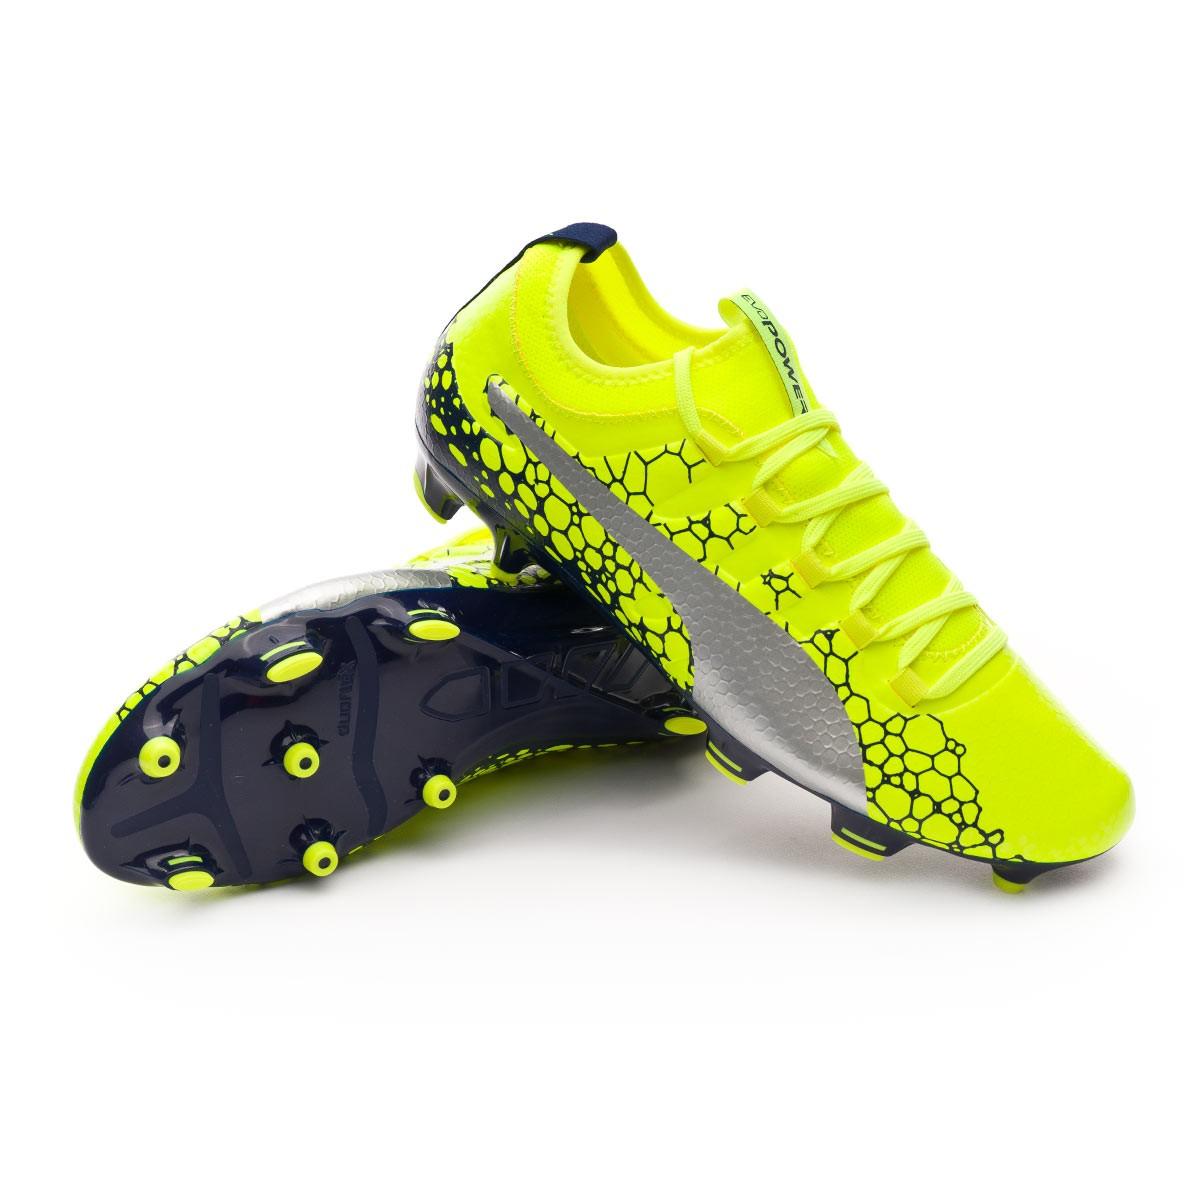 949aa38308eb Football Boots Puma evoPOWER Vigor 3 Graphic FG Safety yellow-Silver ...